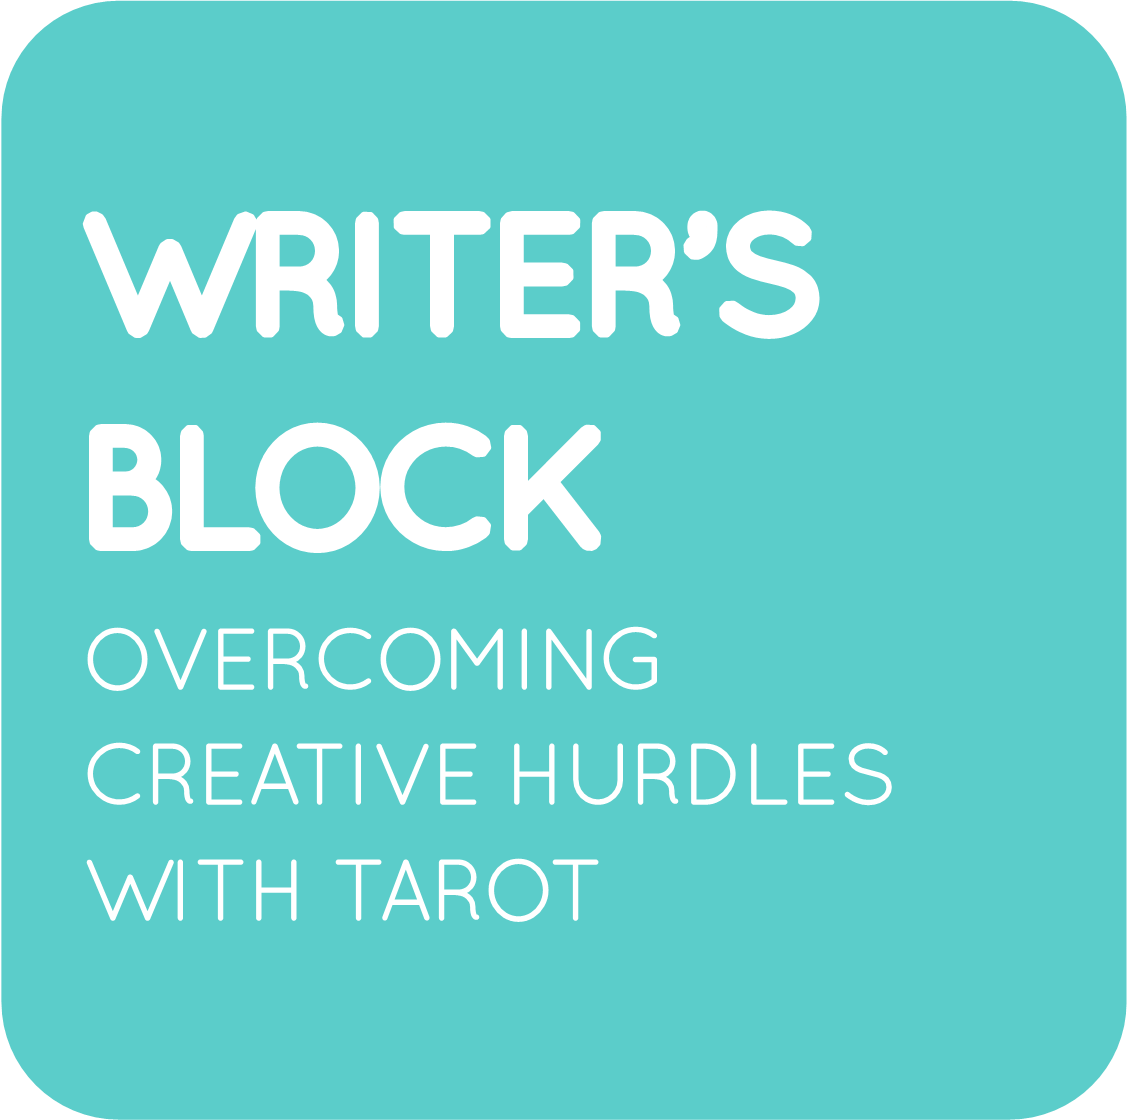 14-writer's block readings.png